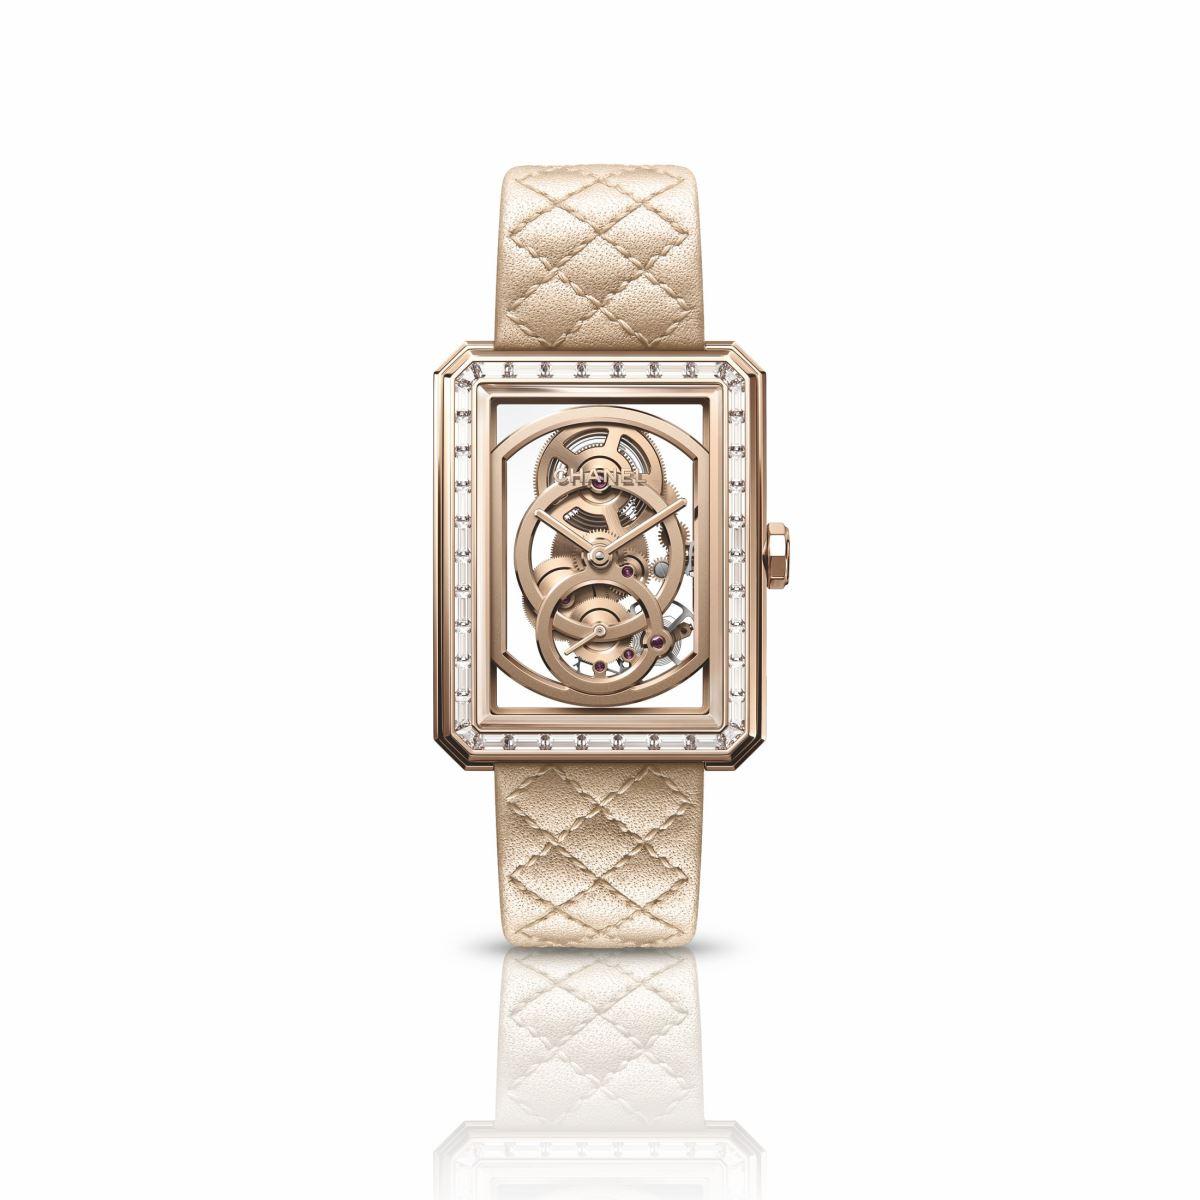 Đồng hồ Chanel Boy•Friend Skeleton Beige Gold